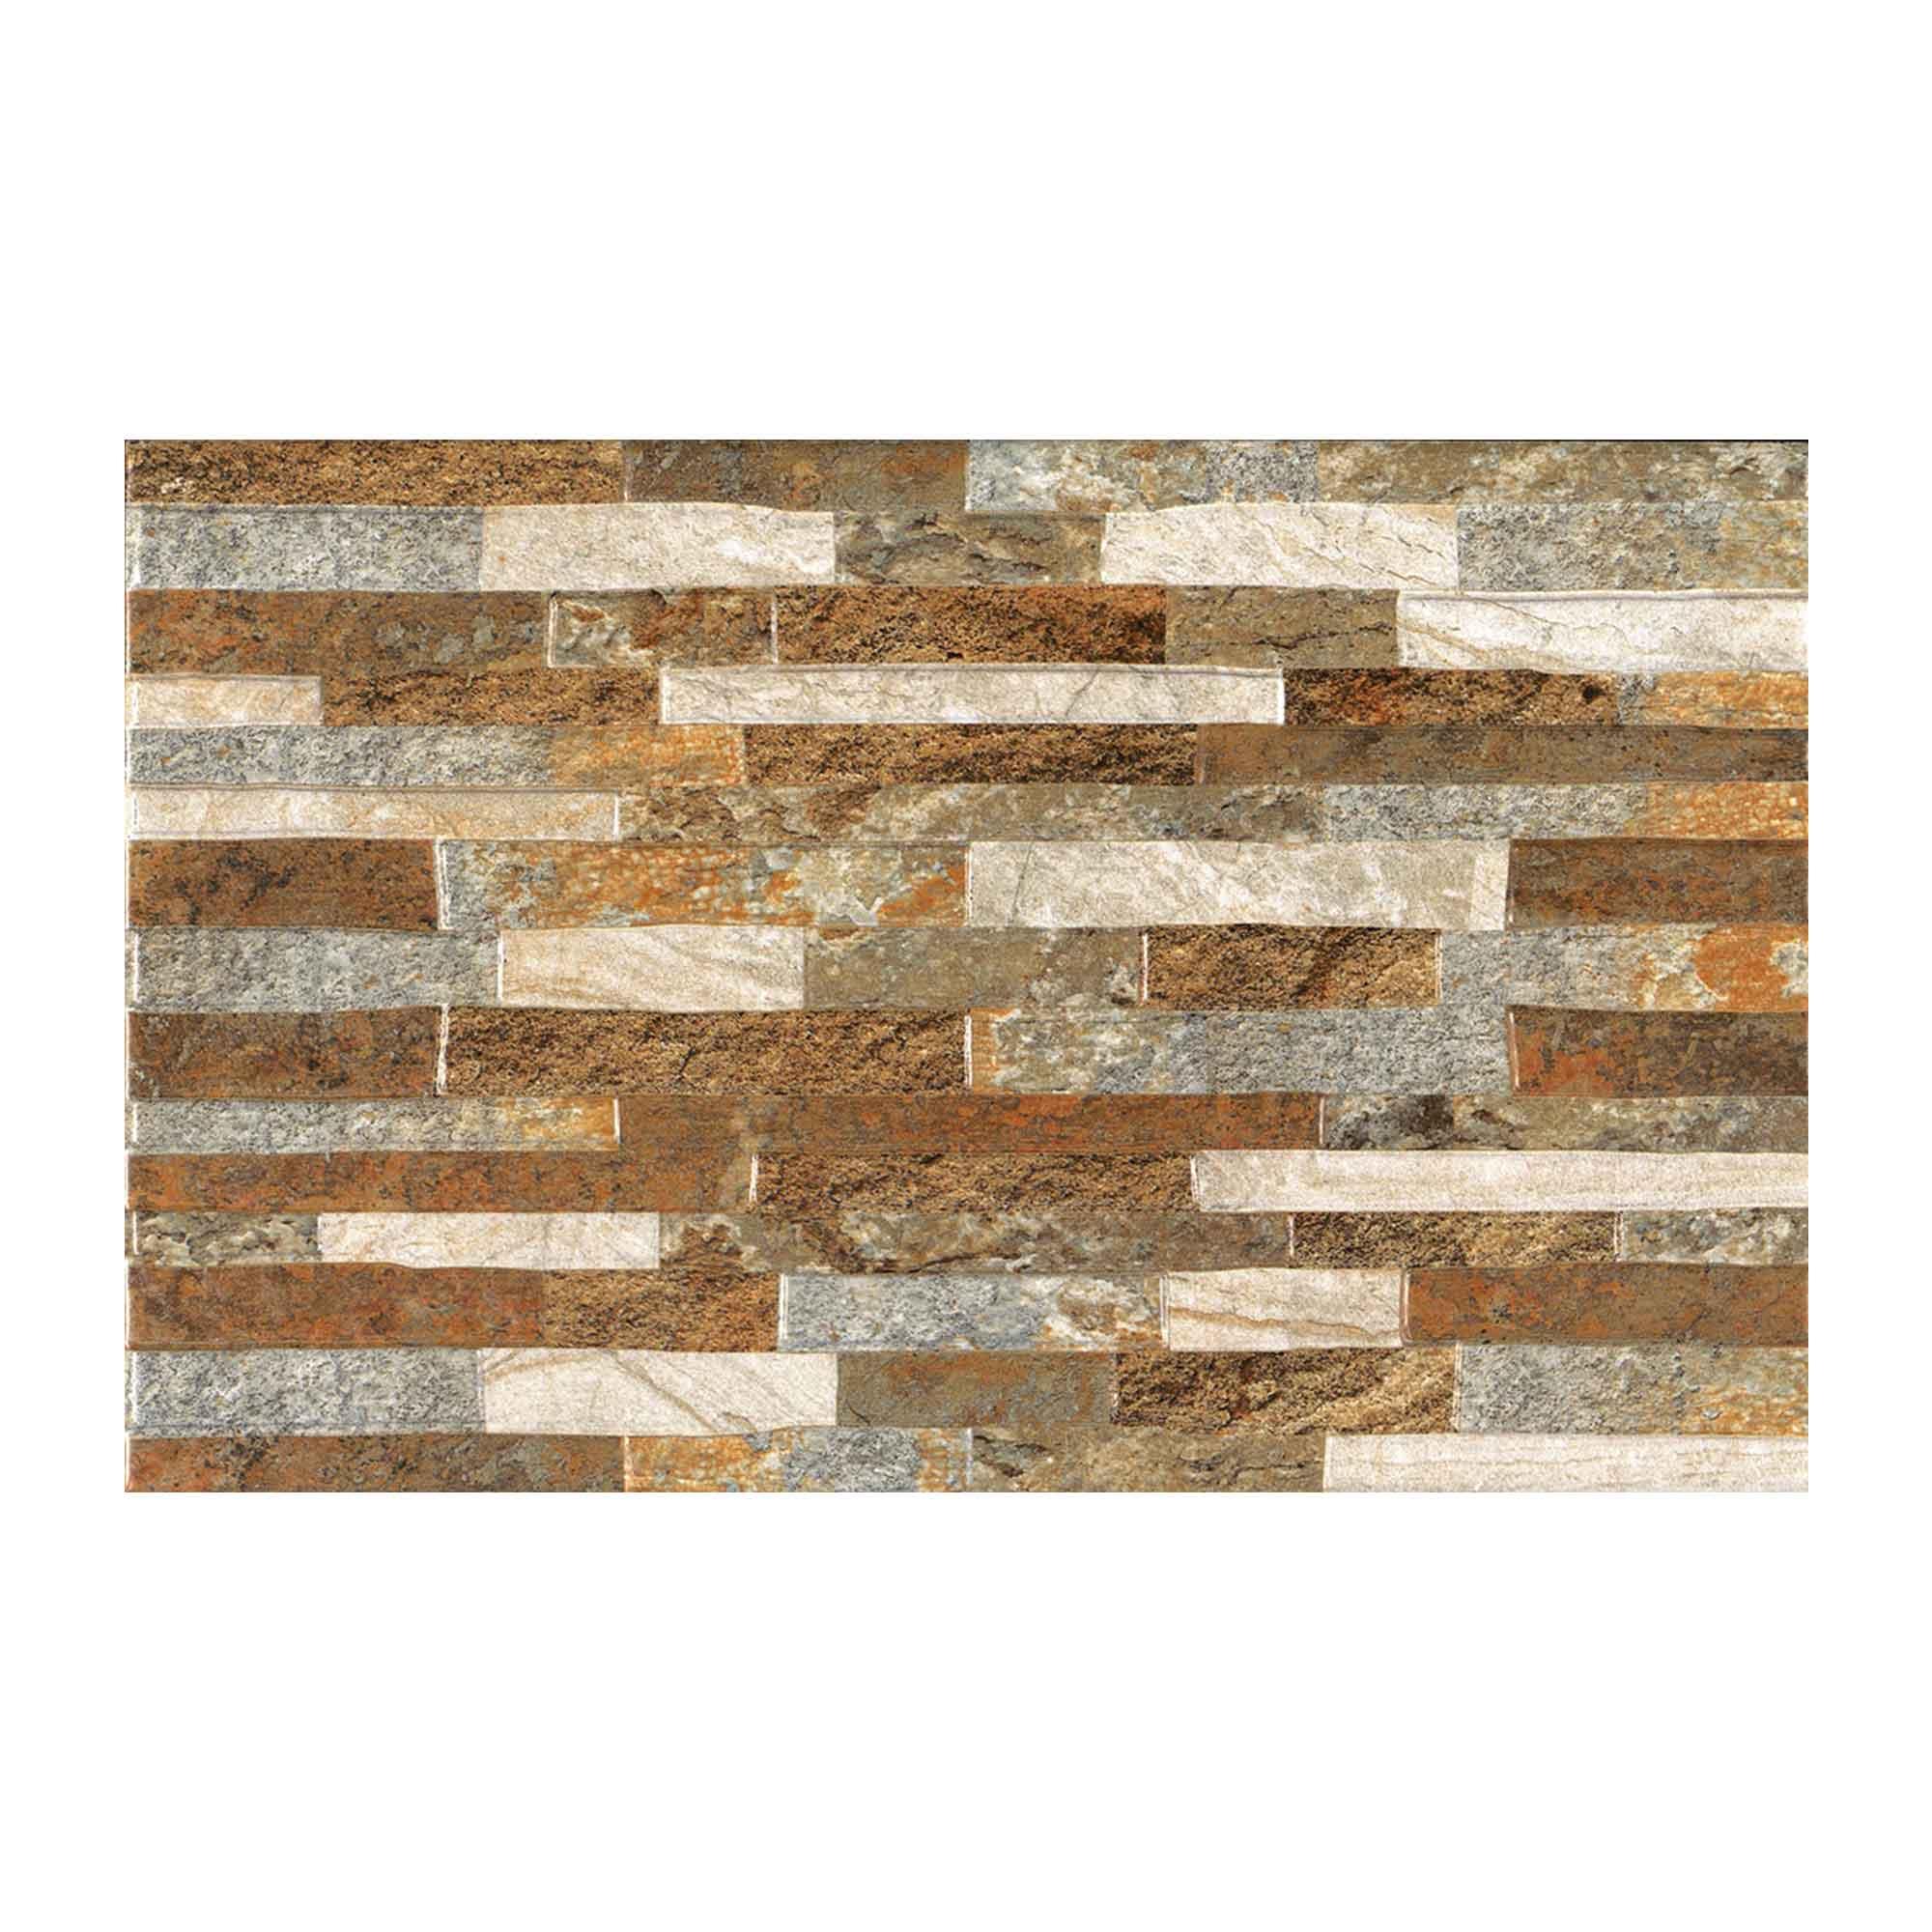 Faianta Cesarom Carving maro, finisaj mat, dreptunghiulara, 25,2 x 40,2 cm imagine 2021 mathaus